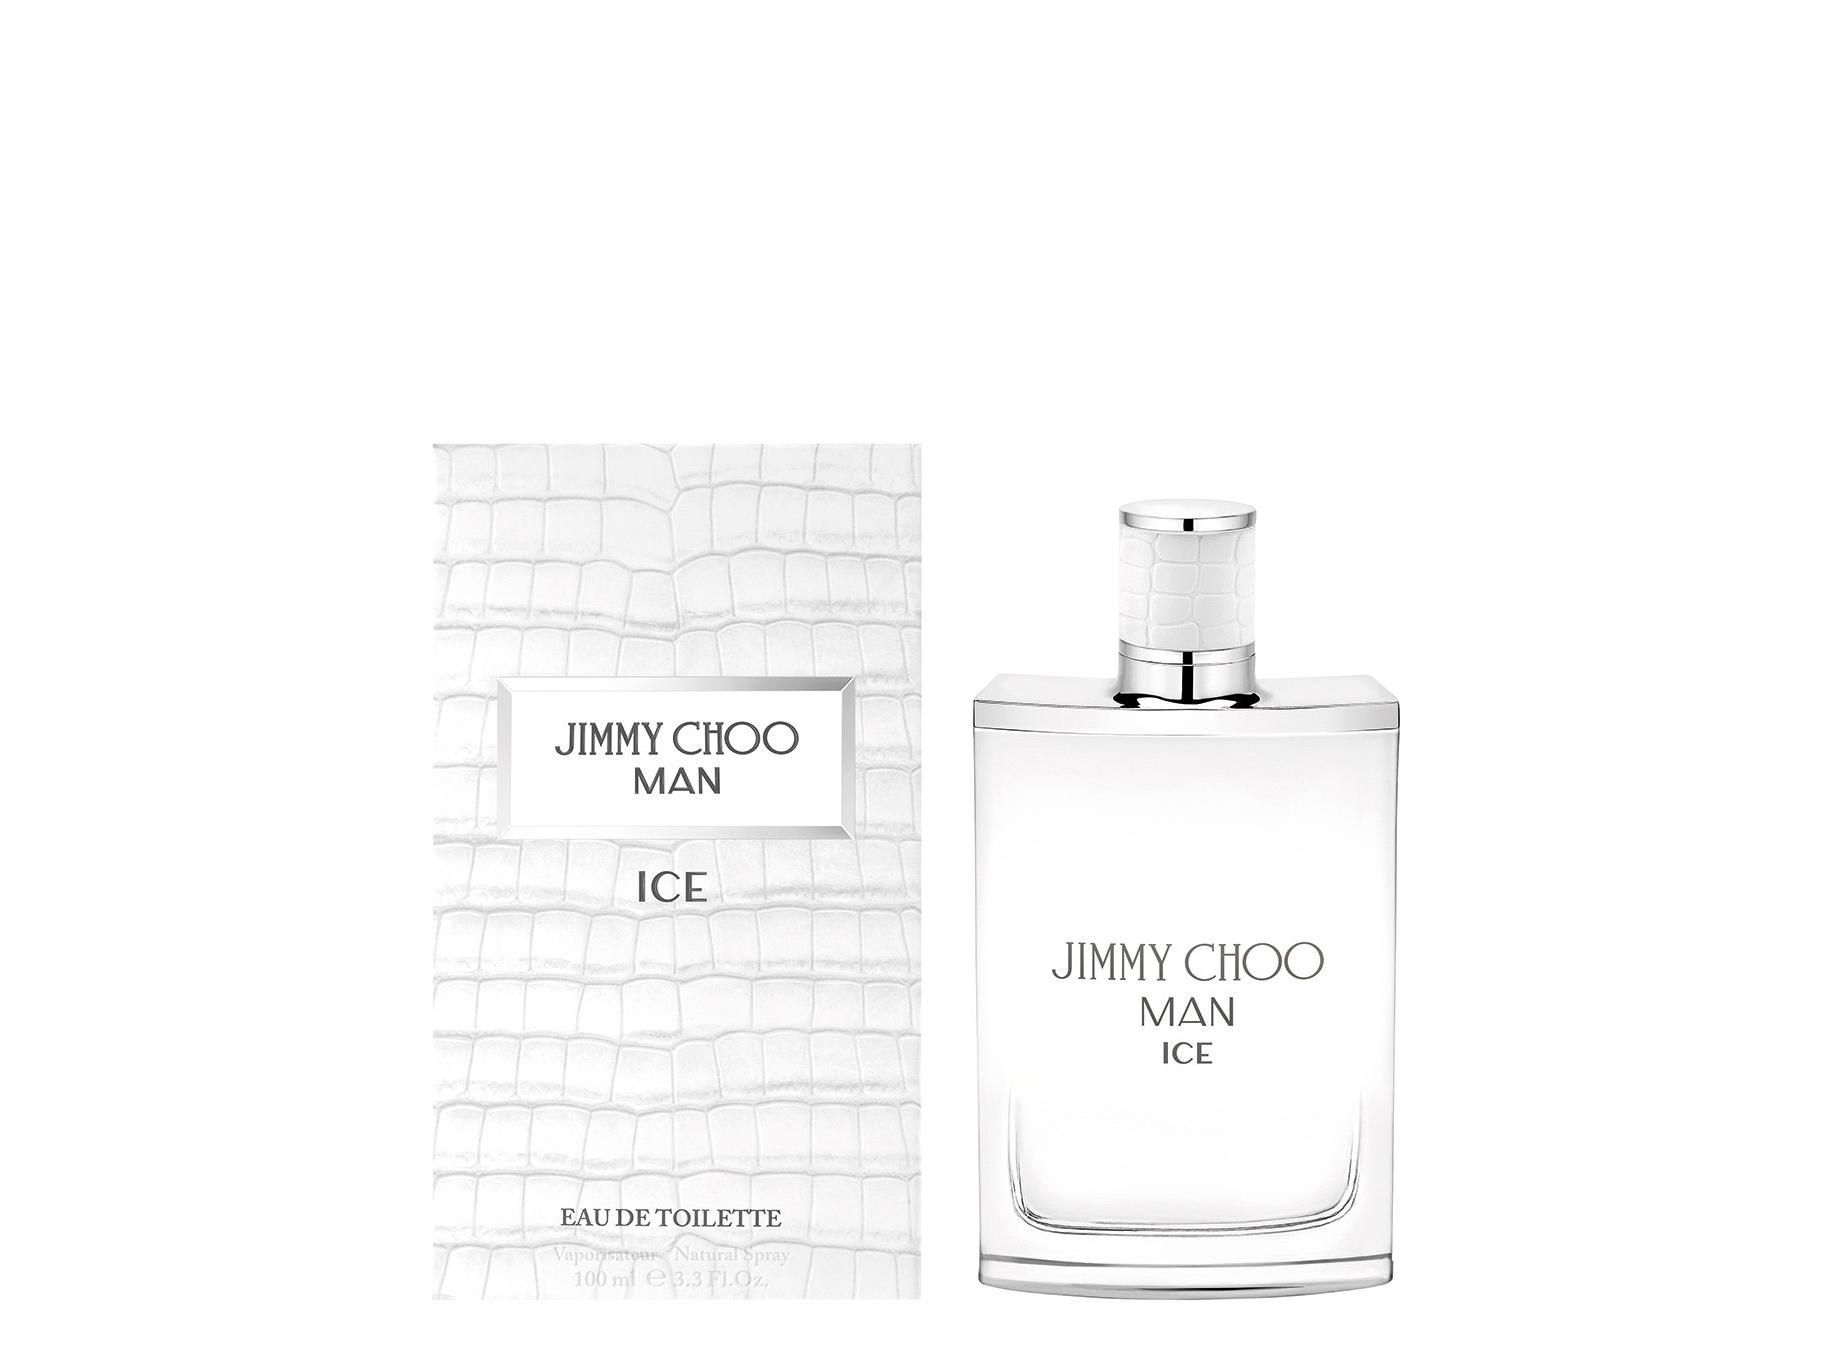 b2f775f2efa0 Jimmy Choo Man Ice Eau De Toilette 100ml - Harvey Nichols